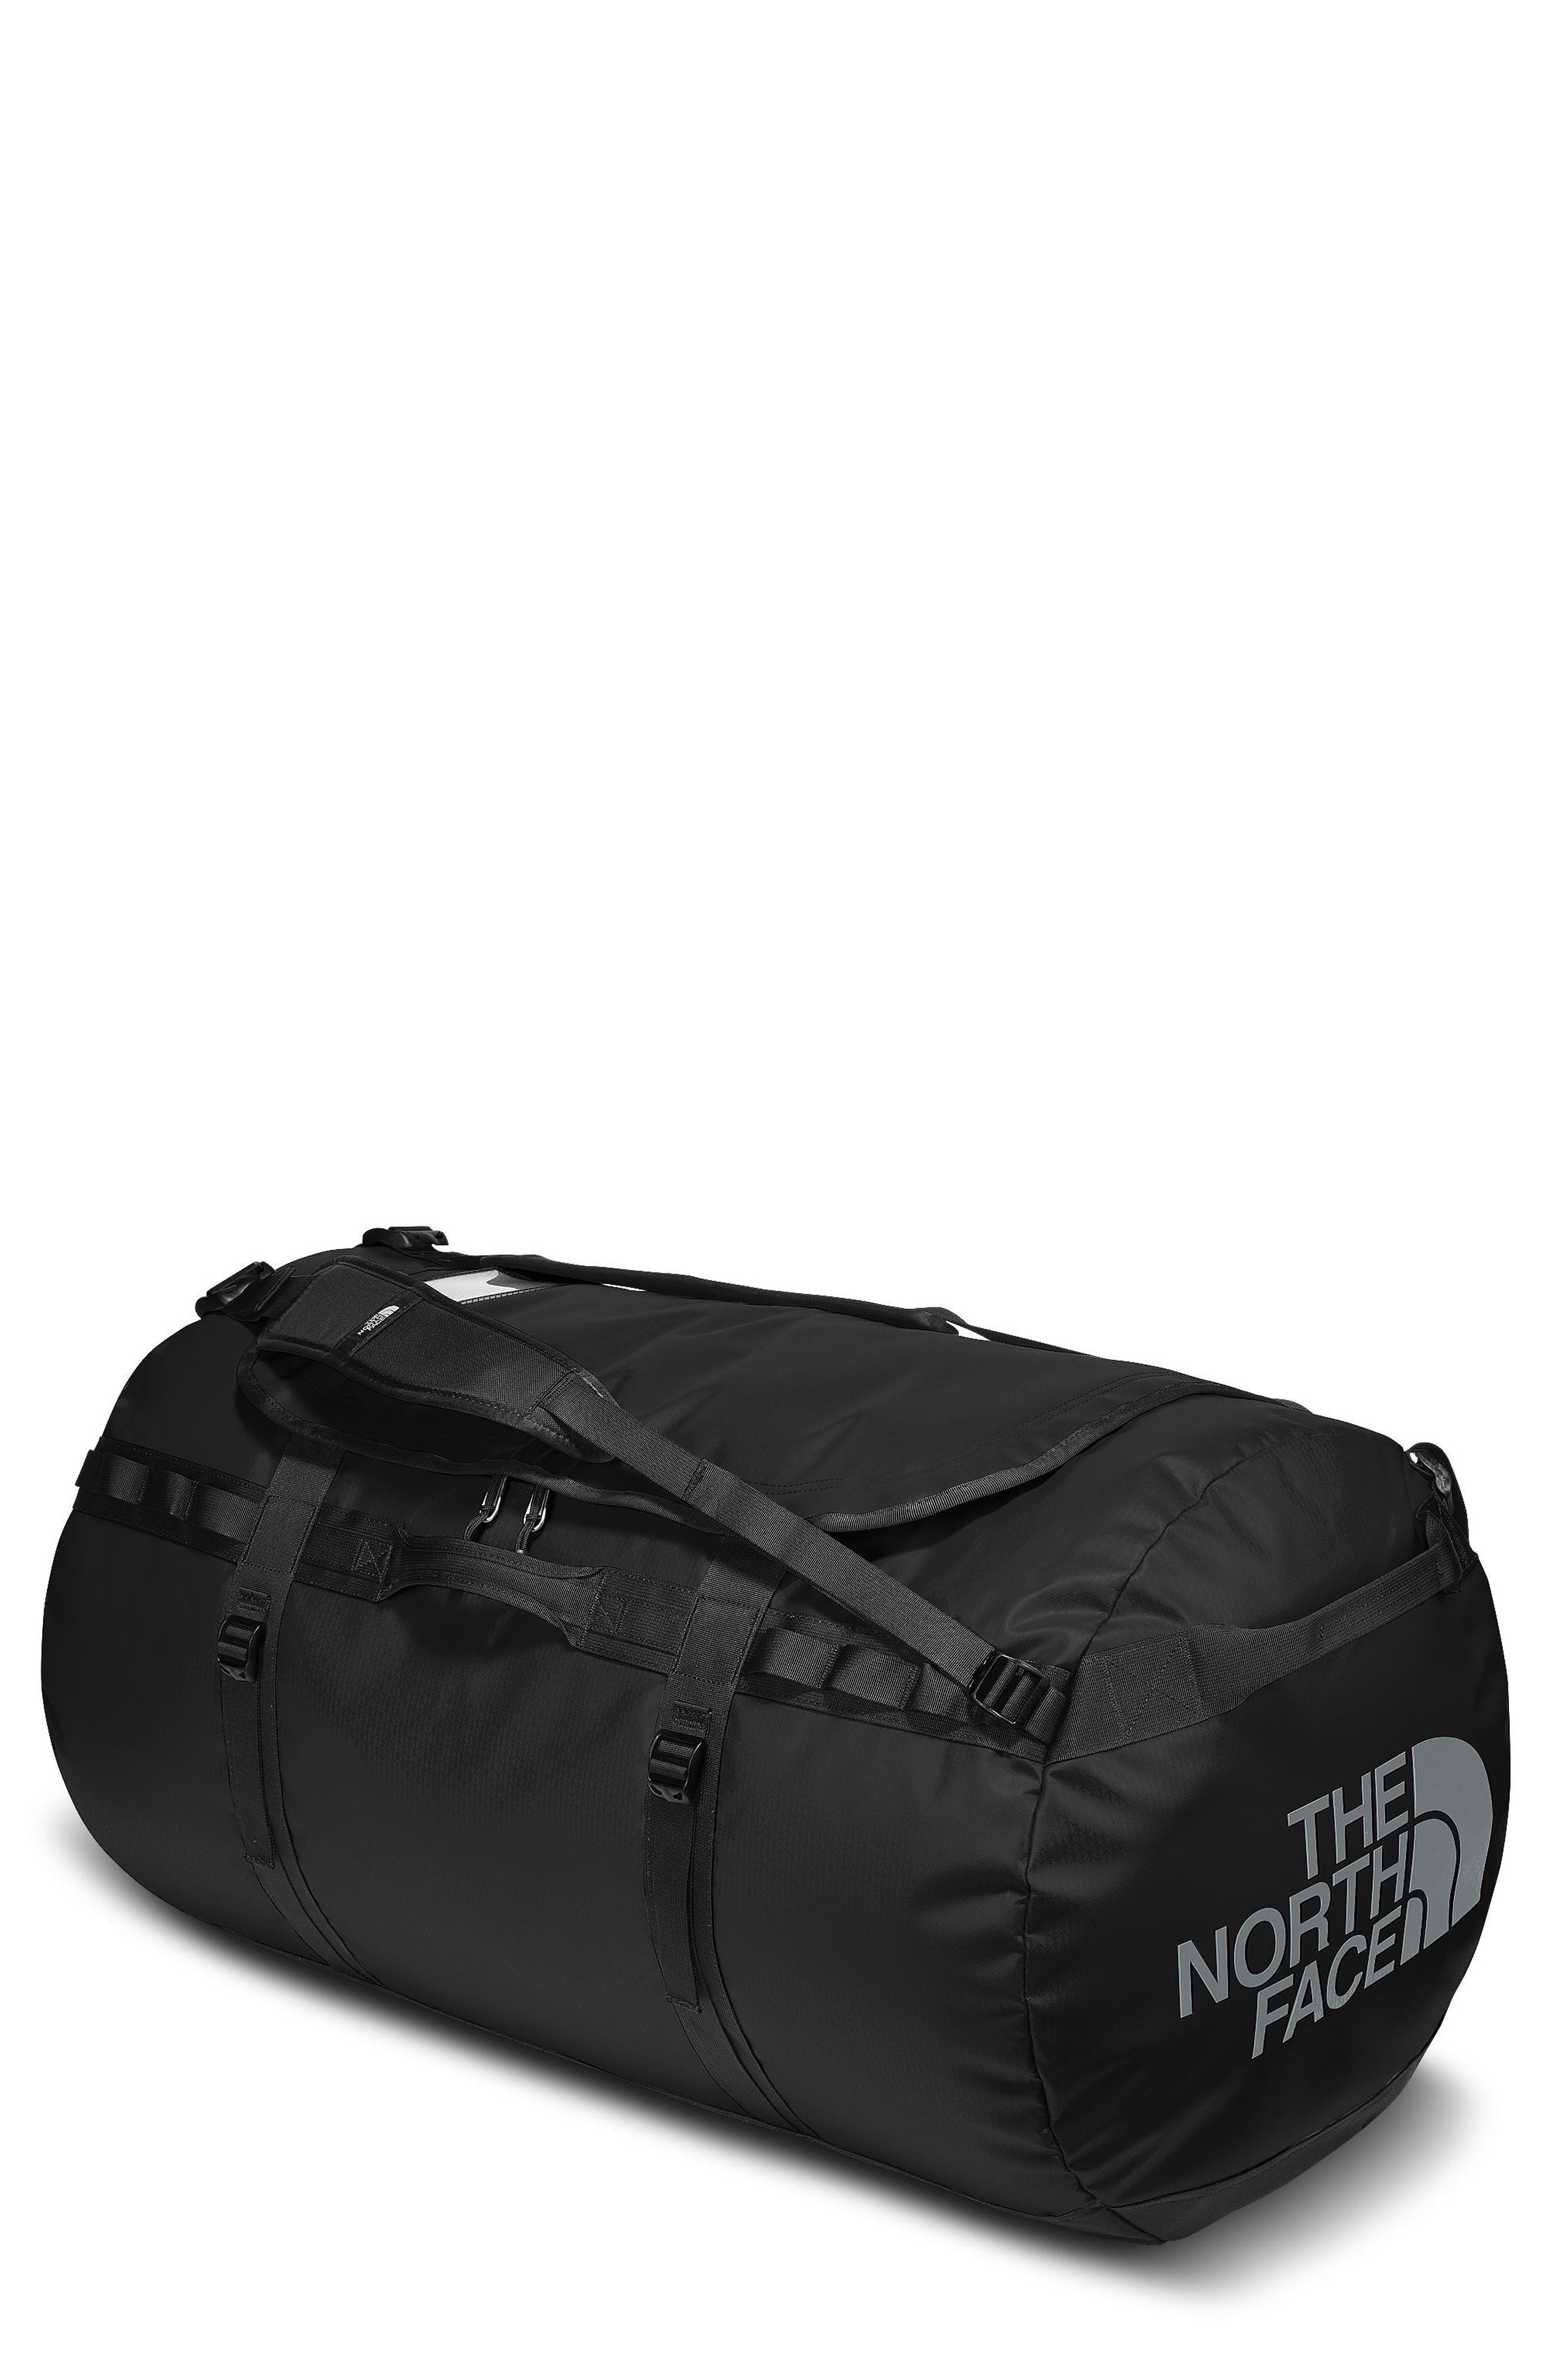 Base Camp XXL Duffel Bag,                         Main,                         color, 001